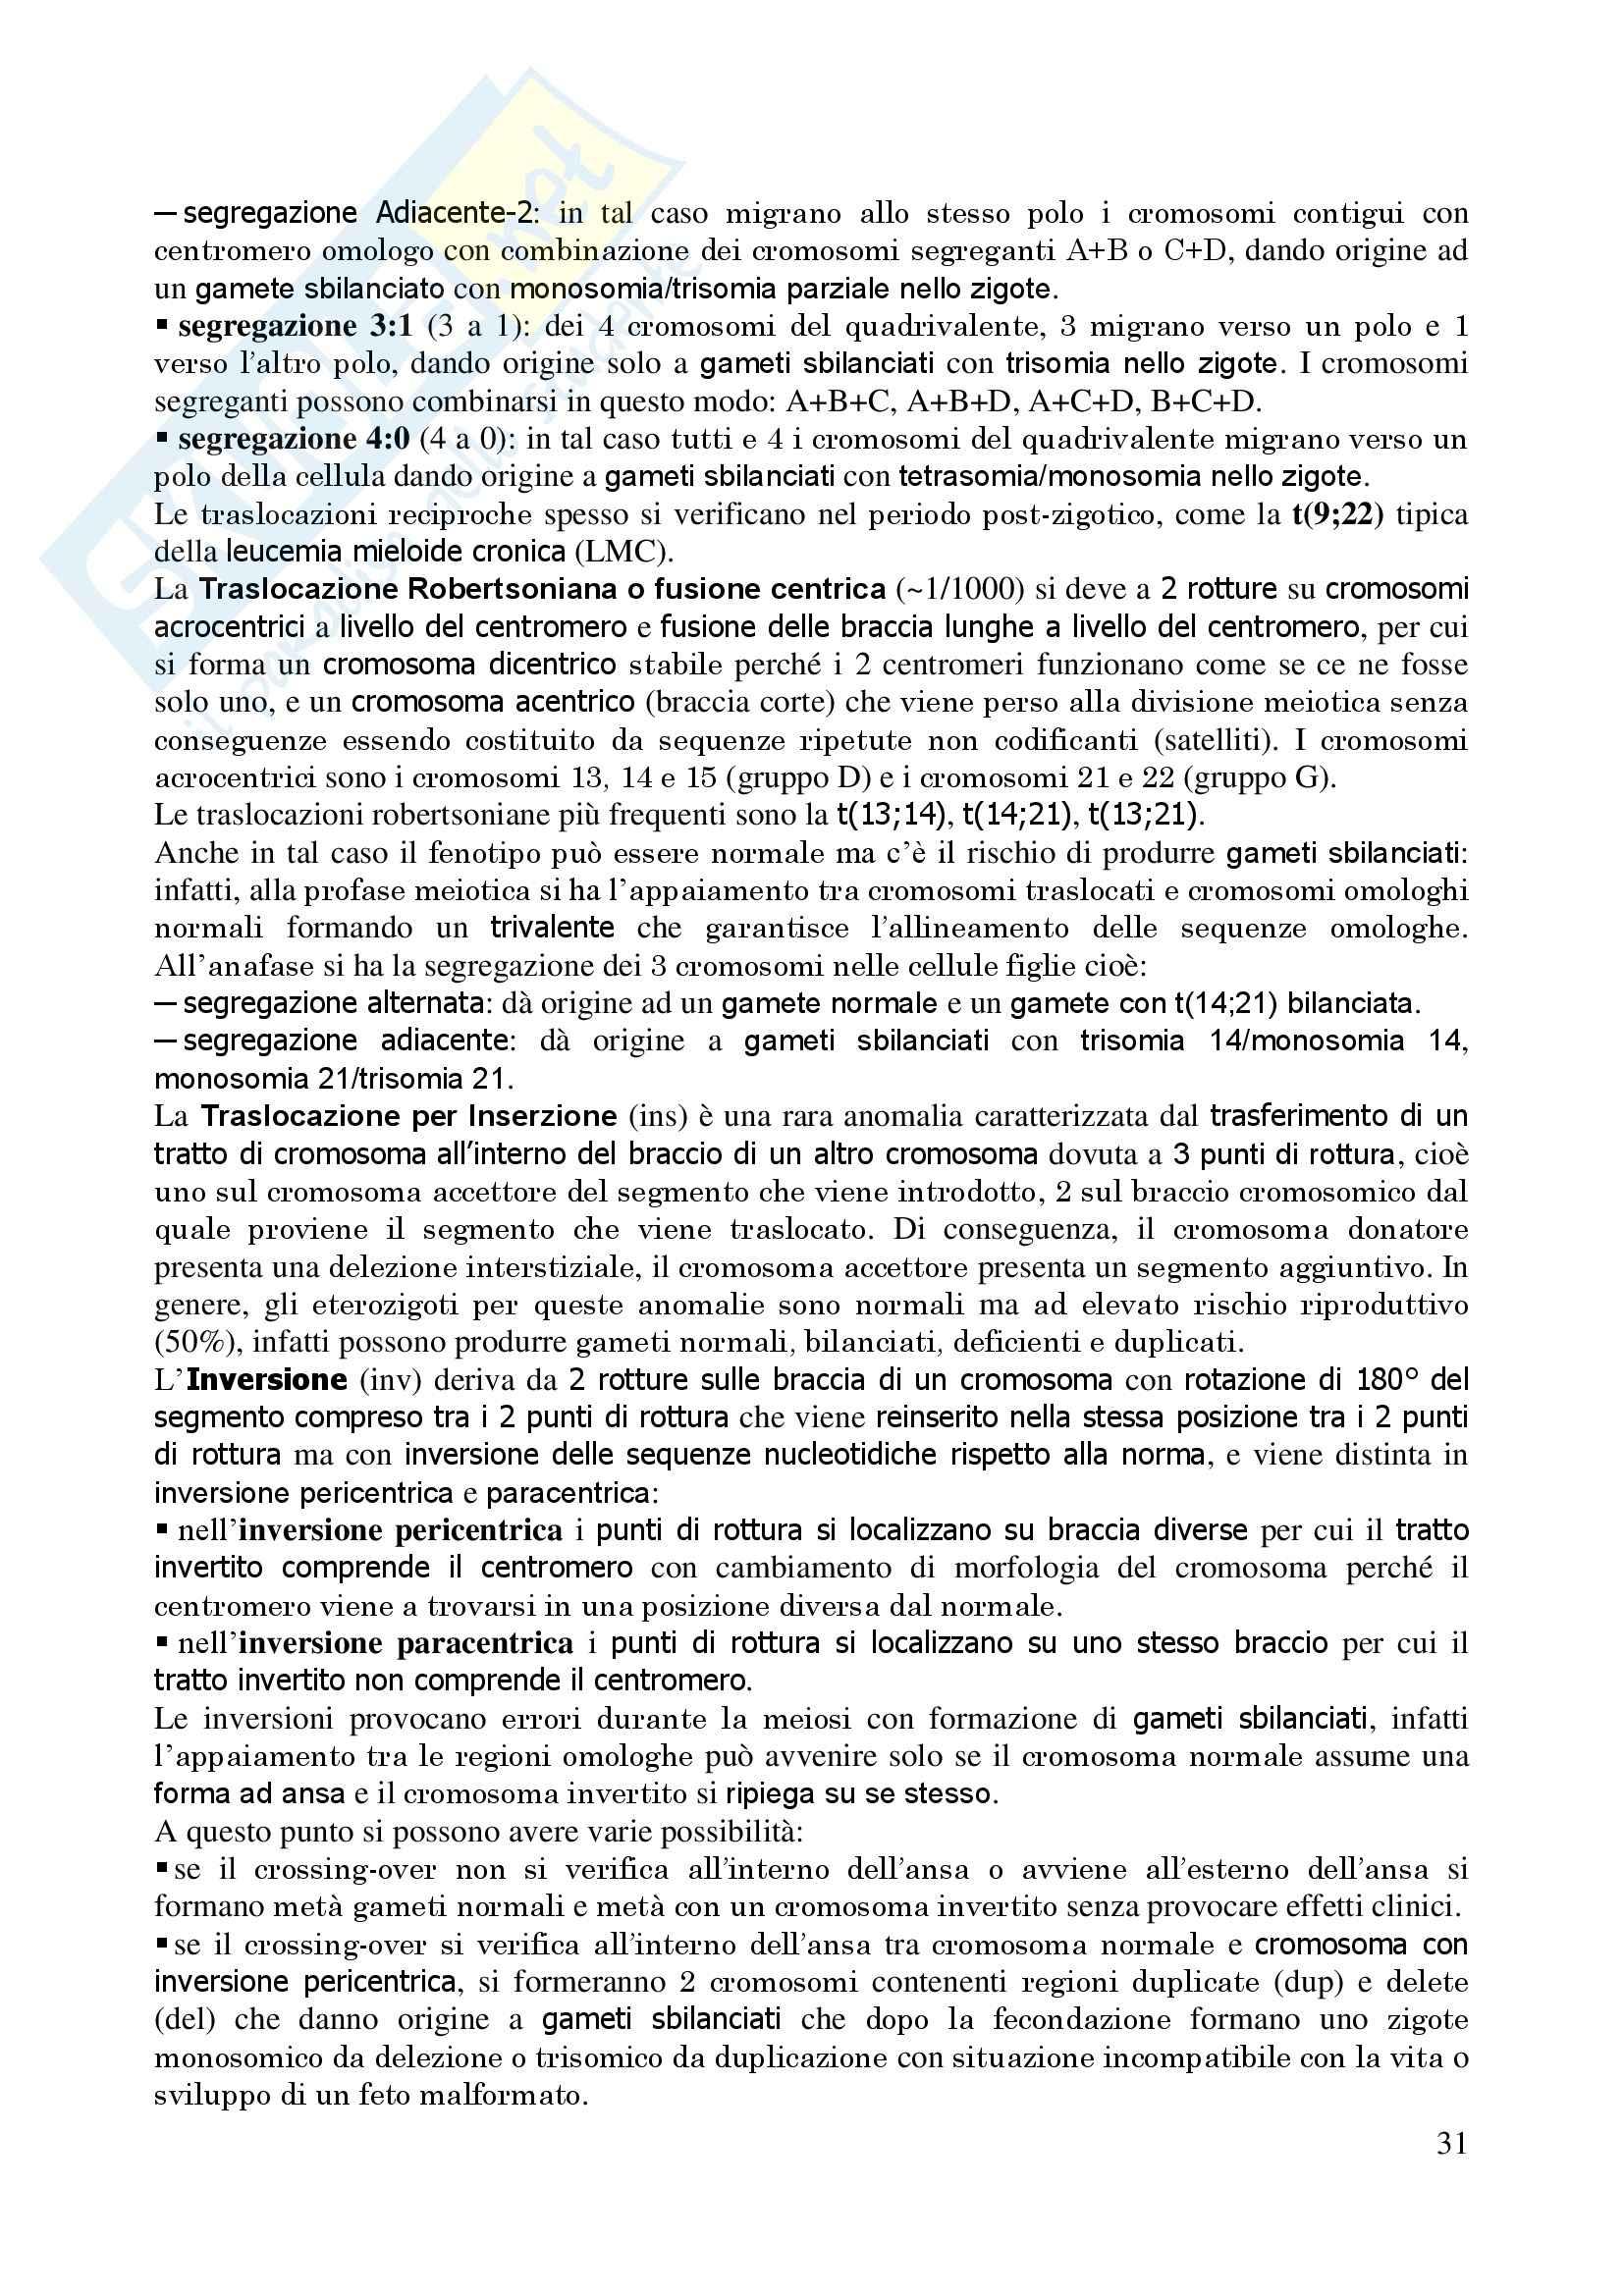 Genetica Umana - Appunti Pag. 31